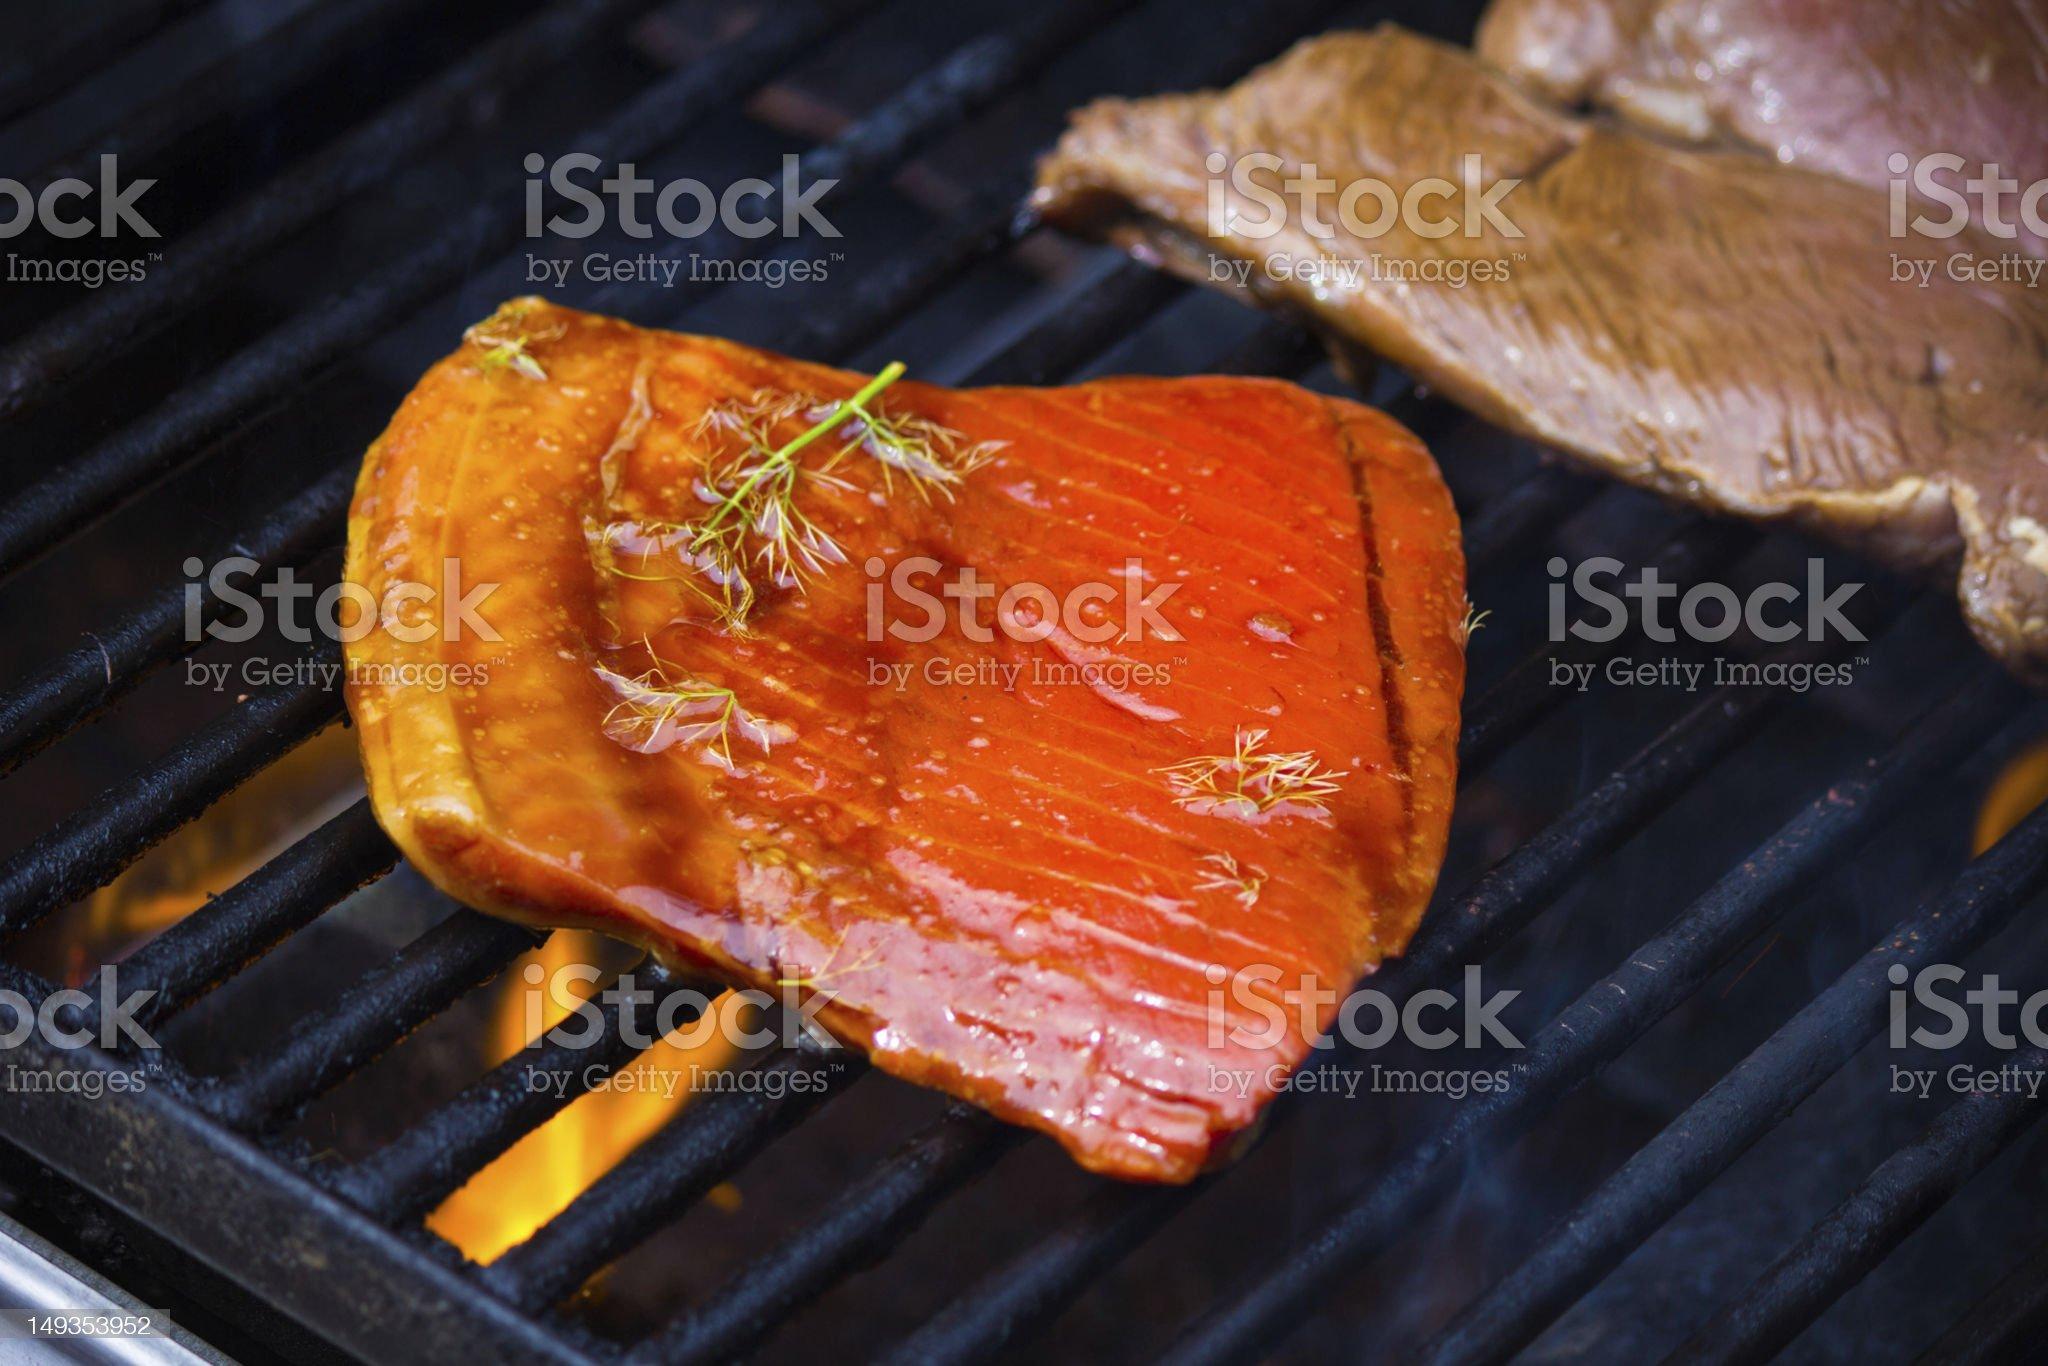 Salmon & Sirloin royalty-free stock photo